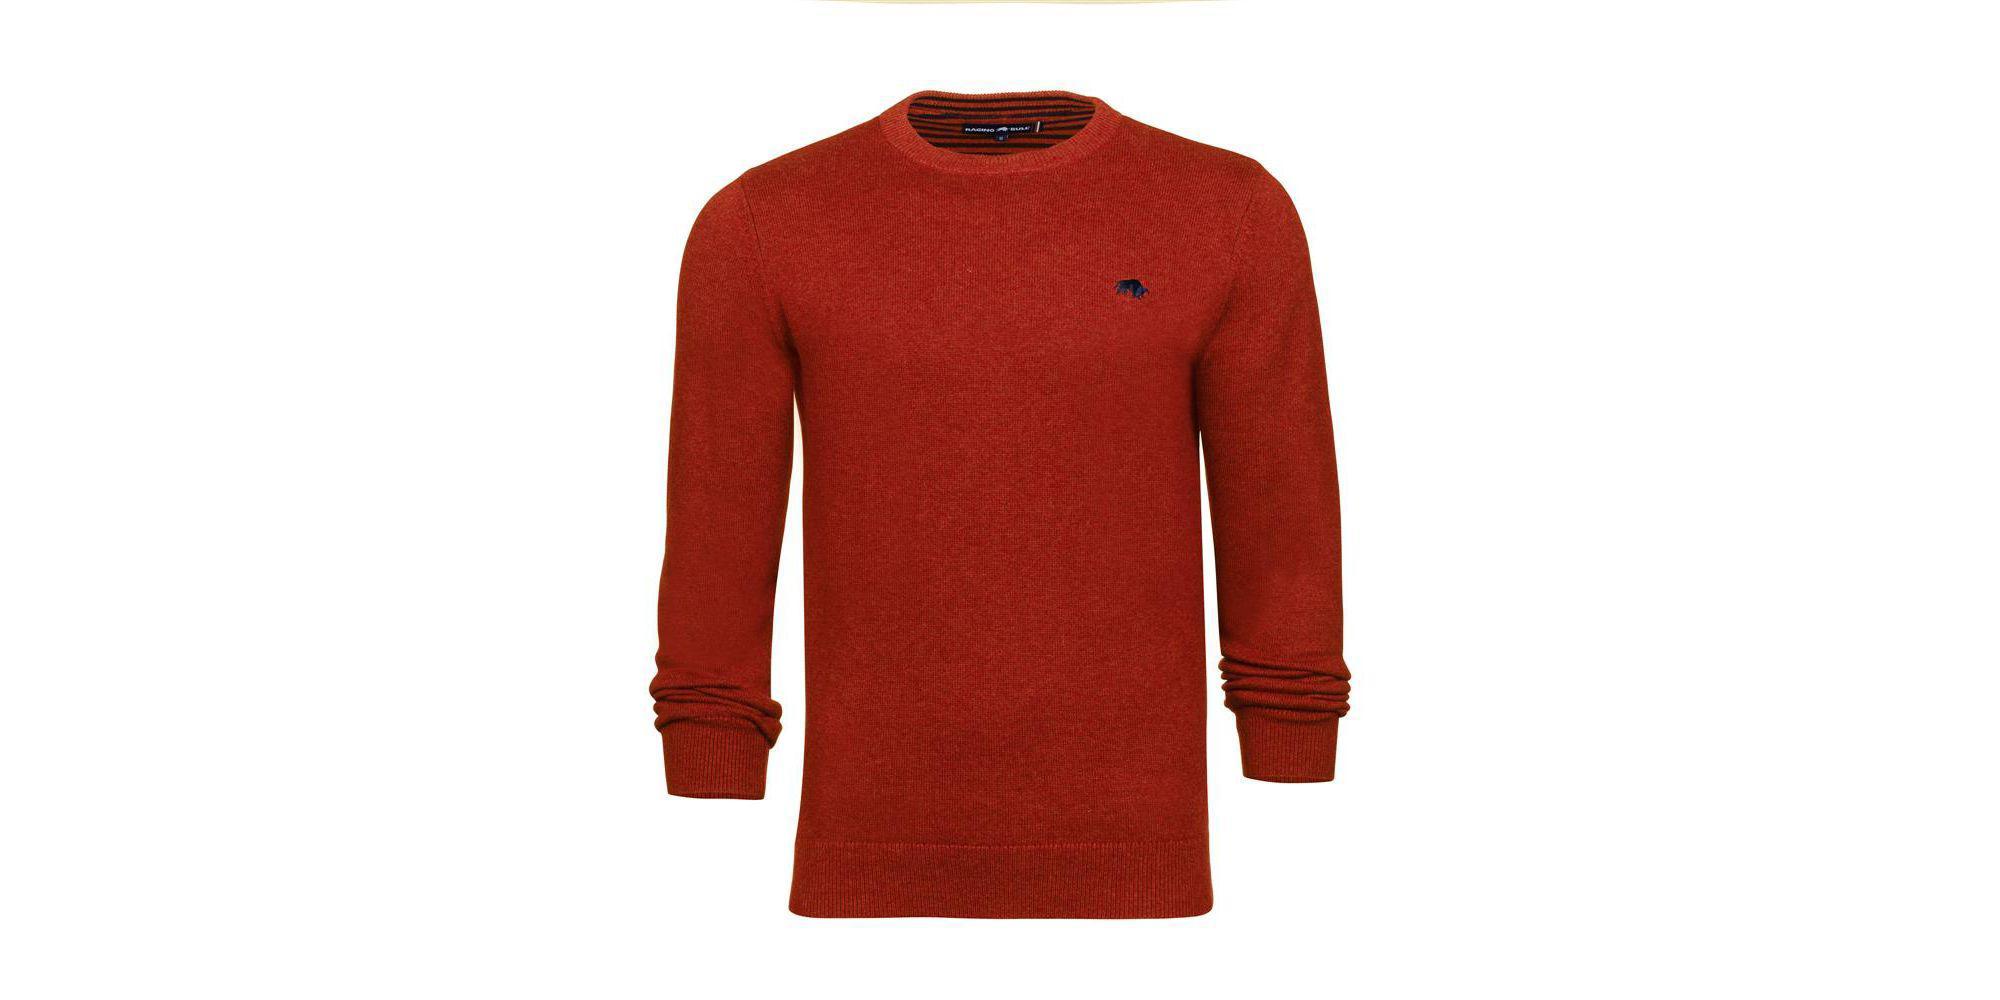 26b7ba5415f3a7 Raging Bull - Orange Crew Neck Cotton Cashmere Sweater for Men - Lyst. View  fullscreen